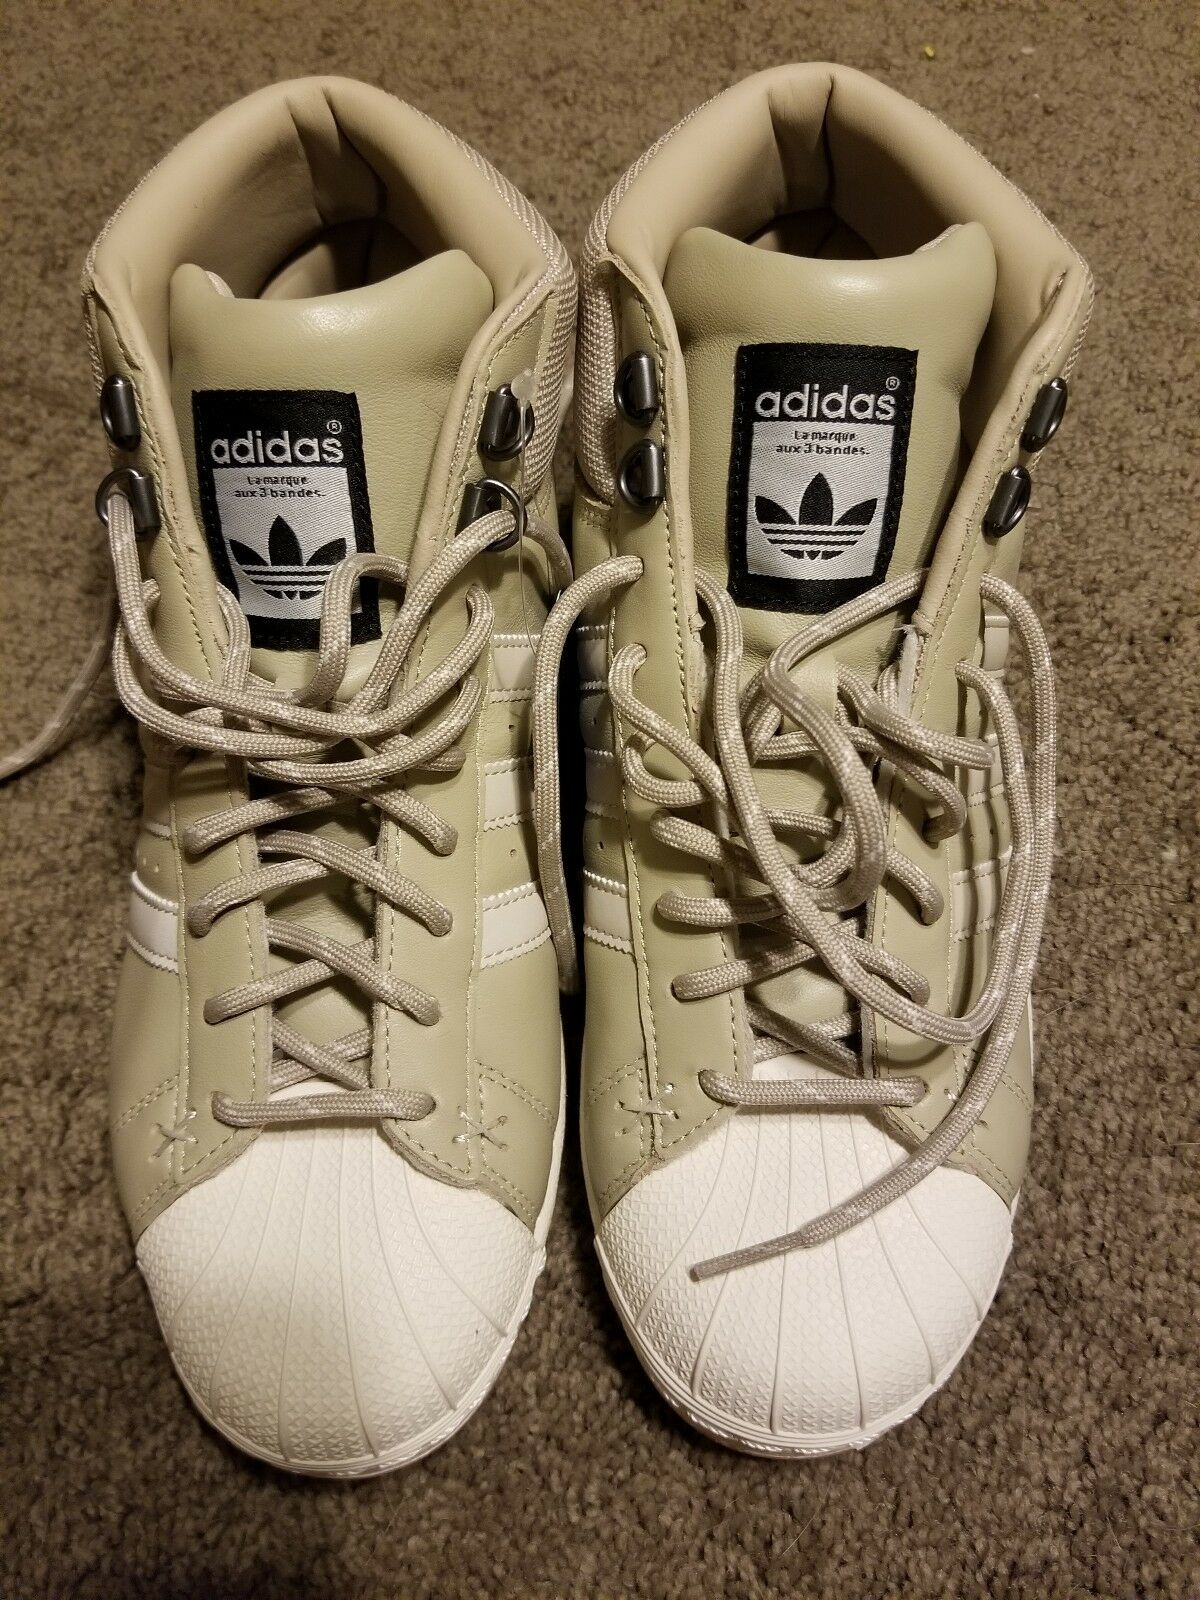 Adidas Pro model Hi Top original superstar Cream performance sneaker shoe new